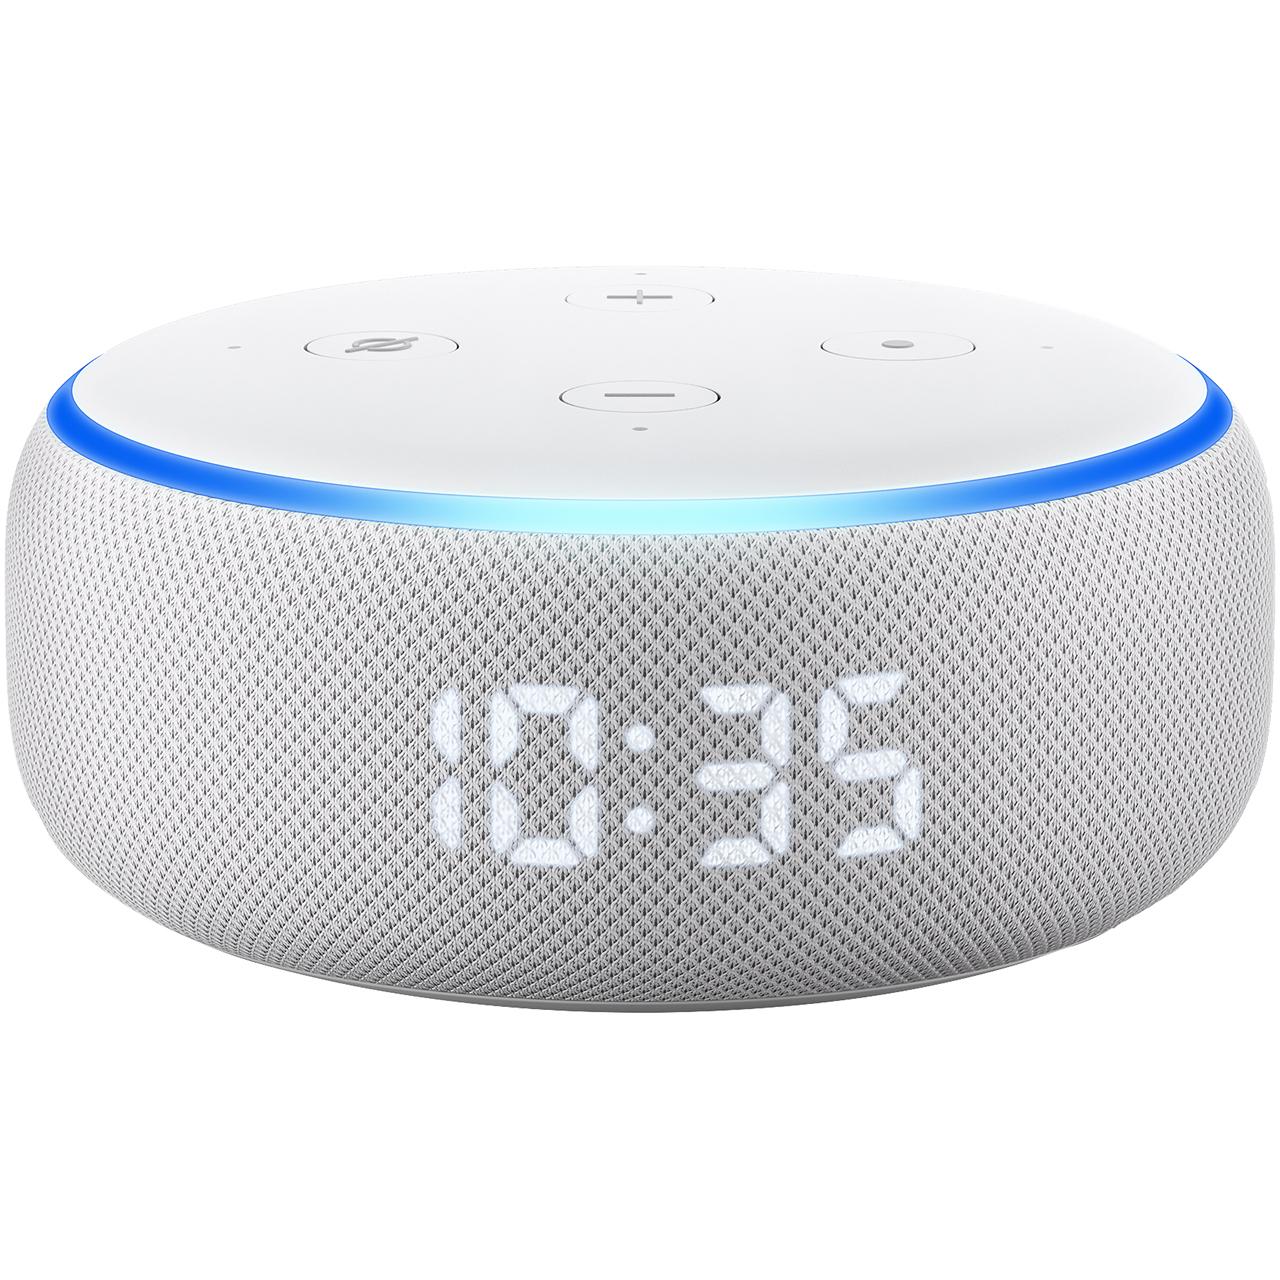 Amazon Echo Dot (3rd Gen) Smart Speaker with Clock with Alexa - Sandstone - £39 Delivered @ AO